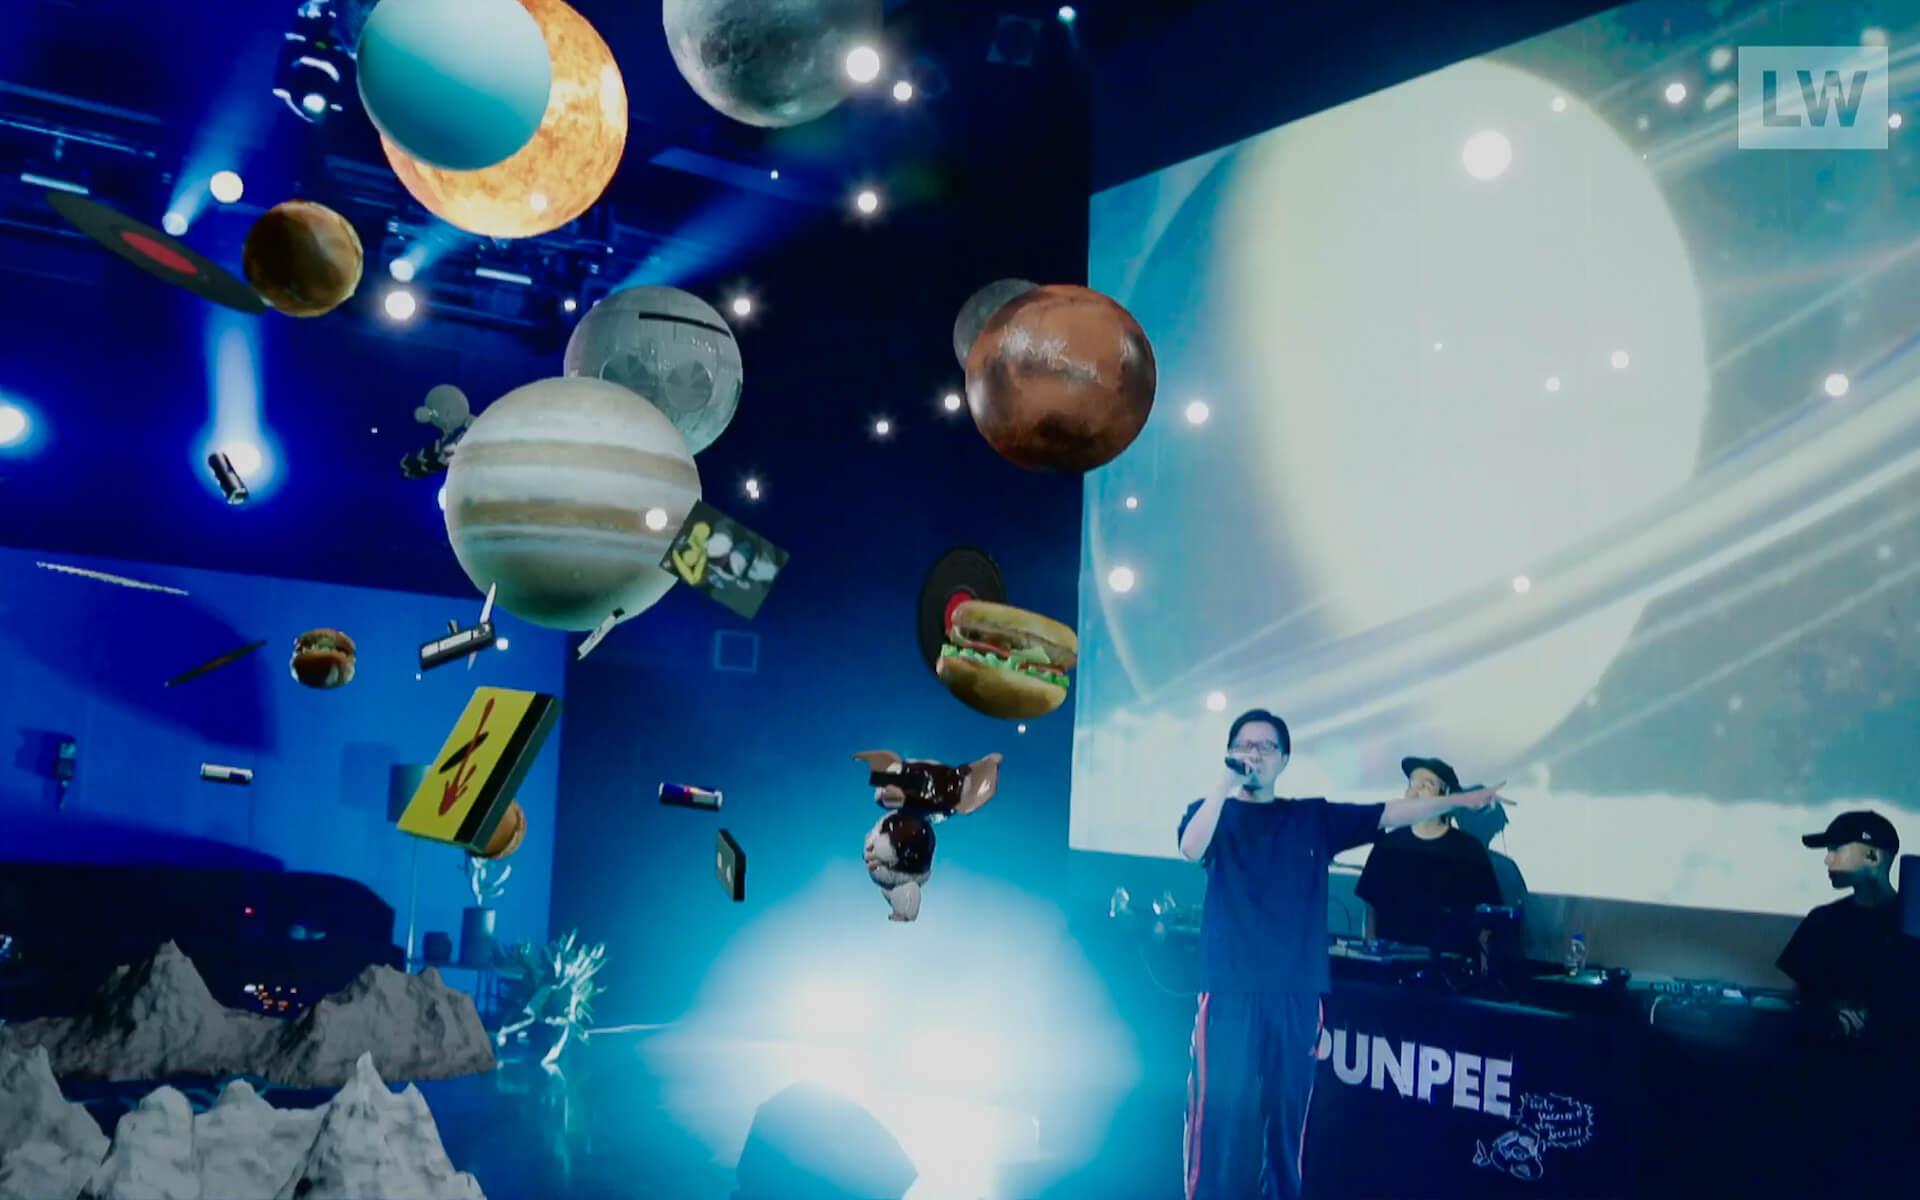 LIVEWIRE PUNPEE<Sofa Kingdomcome>のイースターエッグを一挙紹介! by みやーんZZ music200918_punpee_livewire_7